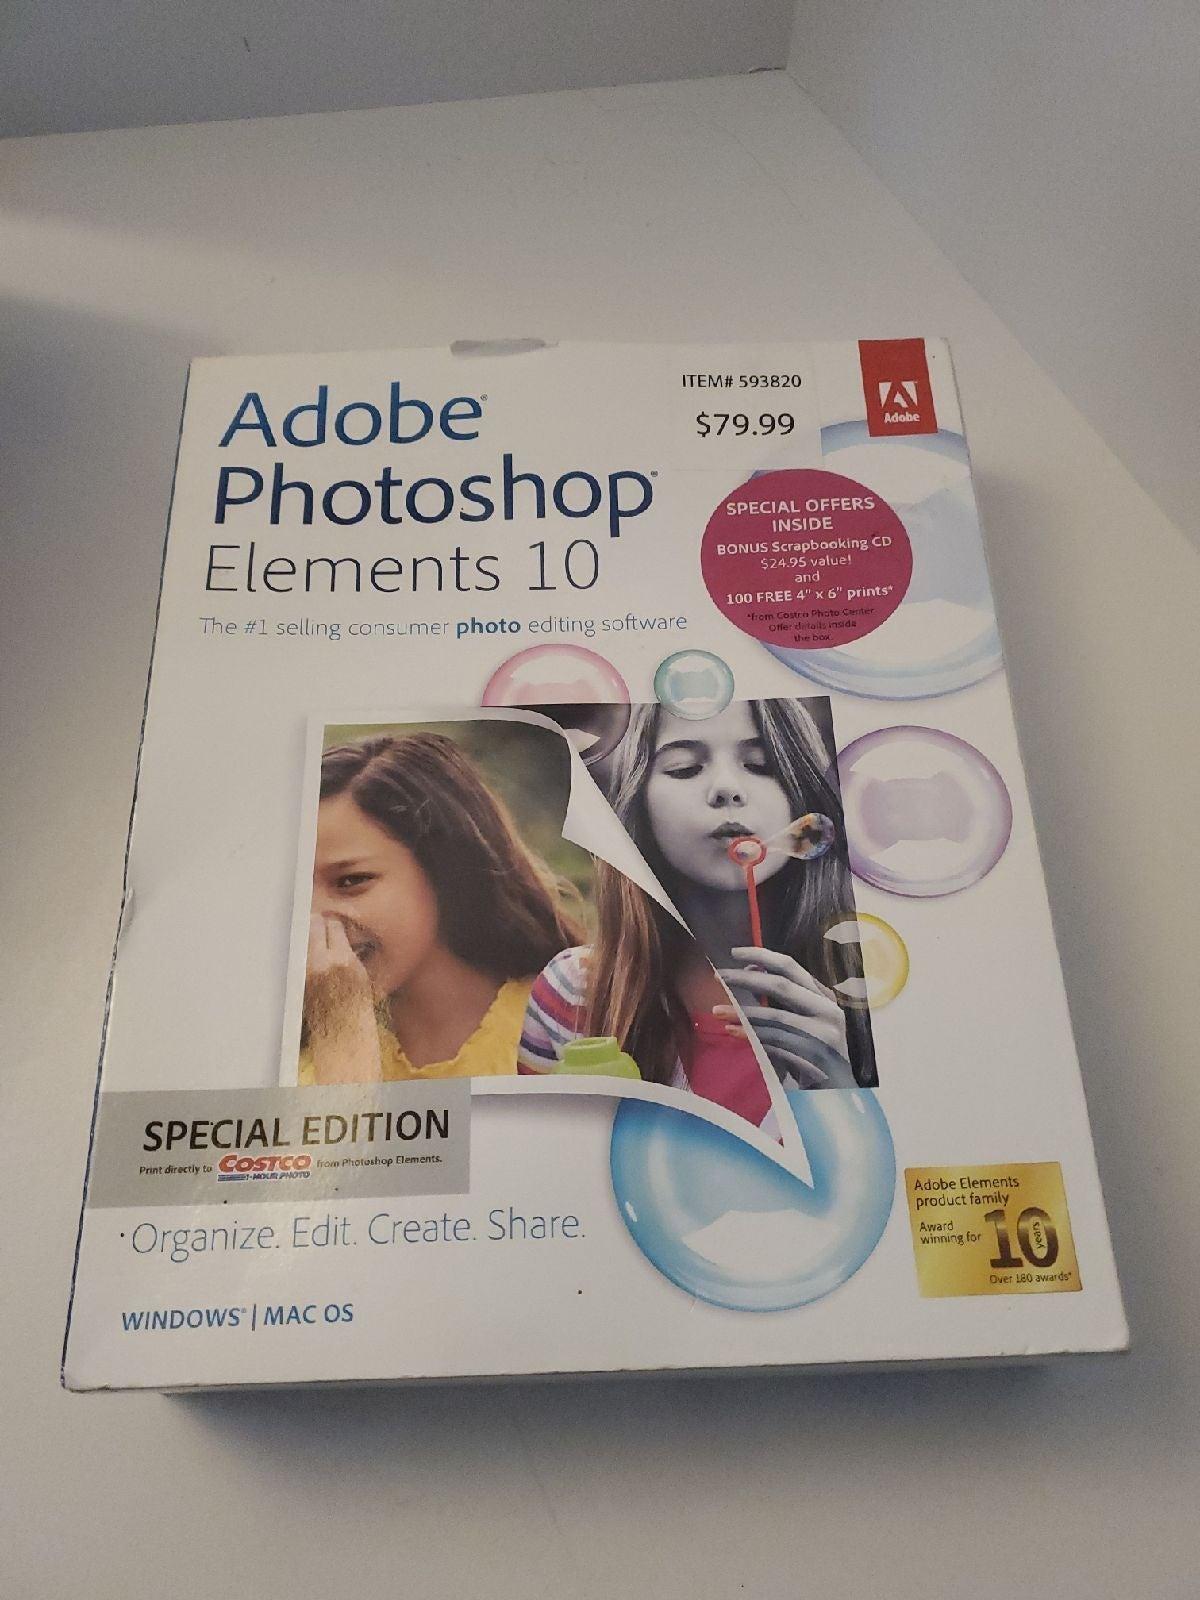 Adobe Photoshop Elements 10 with Bonus N